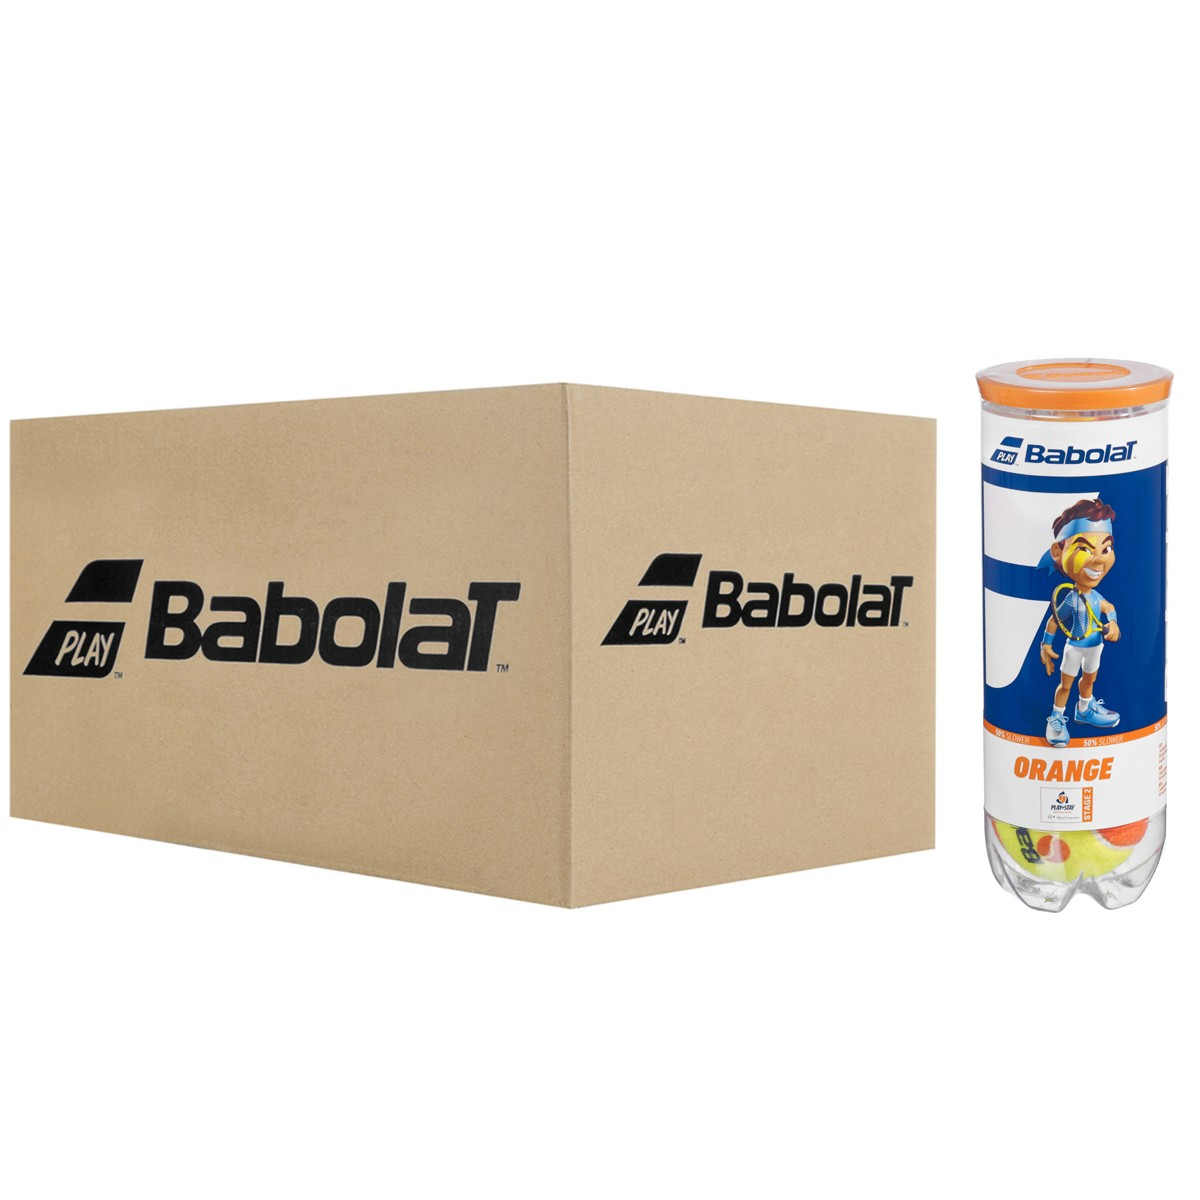 CASE OF 24 CANS OF 3 BABOLAT ORANGE TENNIS BALLS